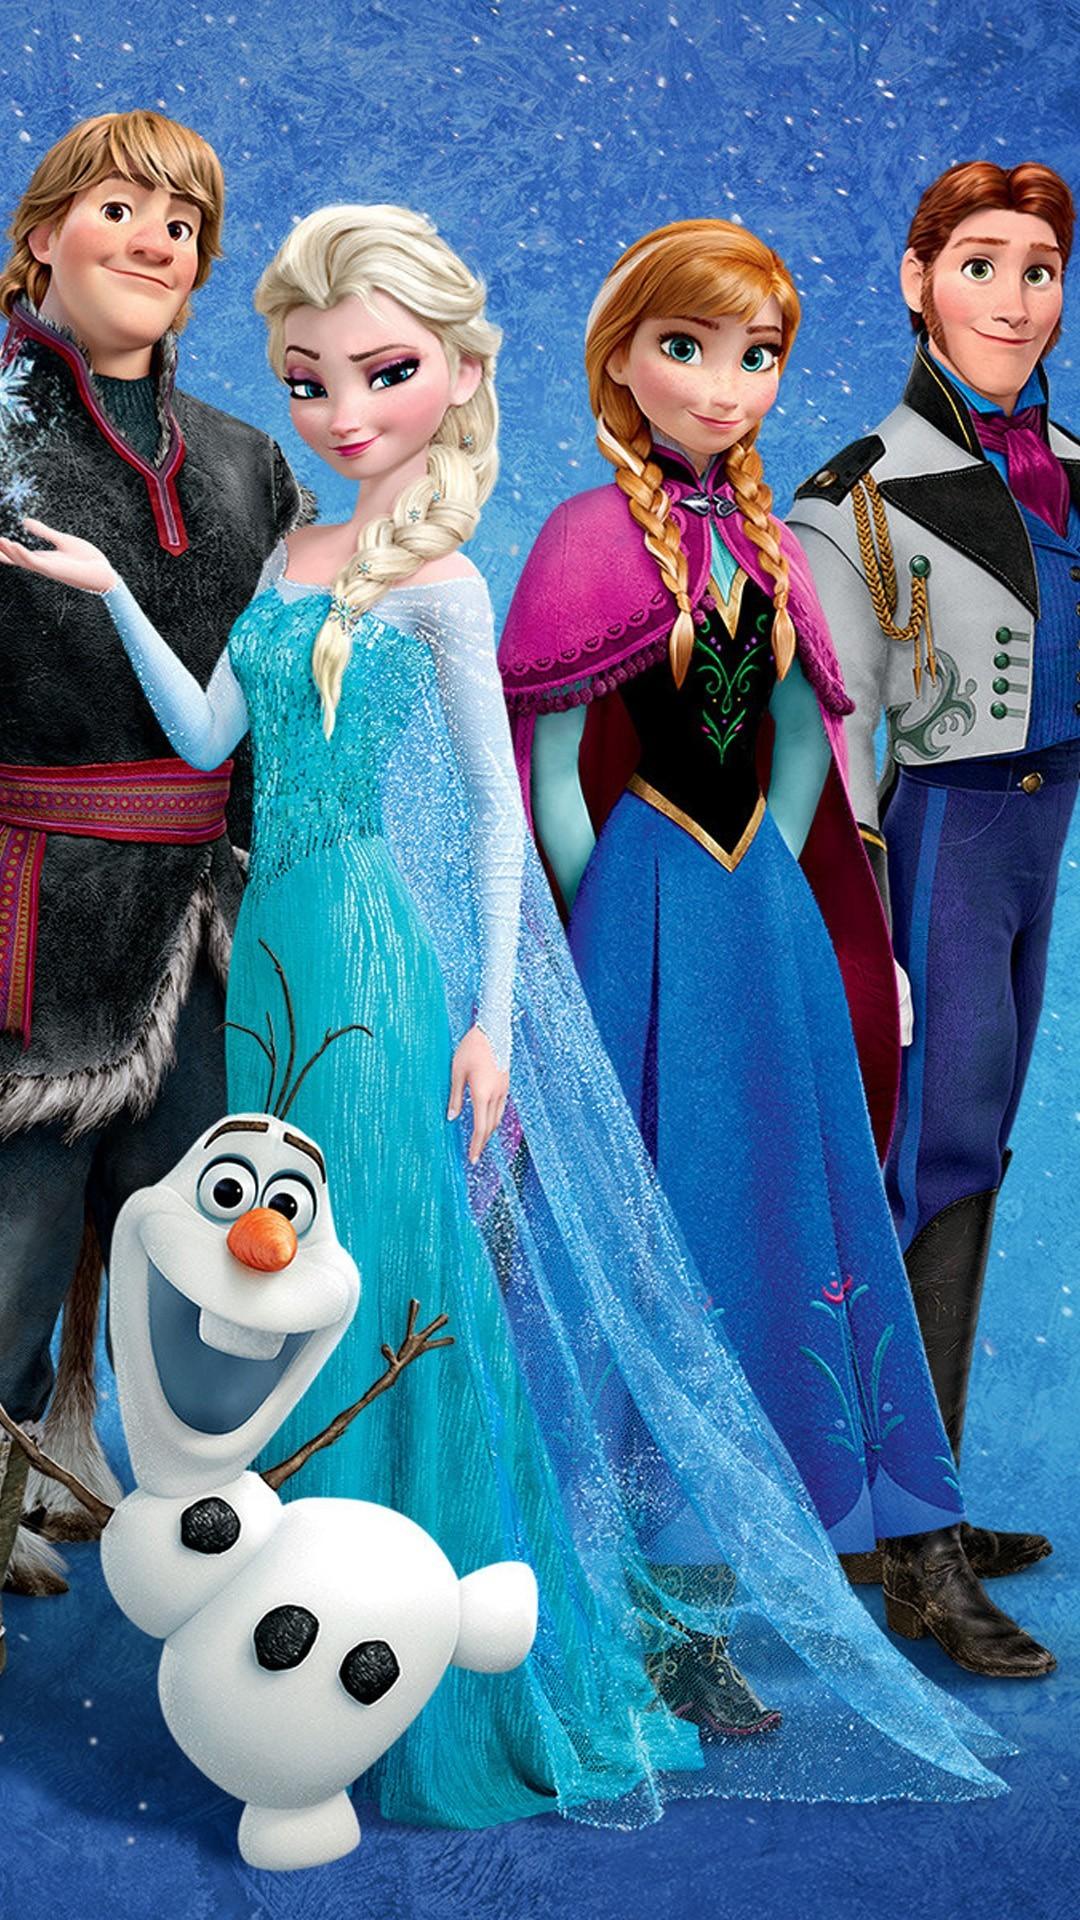 Frozen iPhone 6 plus wallpaper -2014 Christmas Disney Anna Elsa Kristoff  Hans Olaf #2014